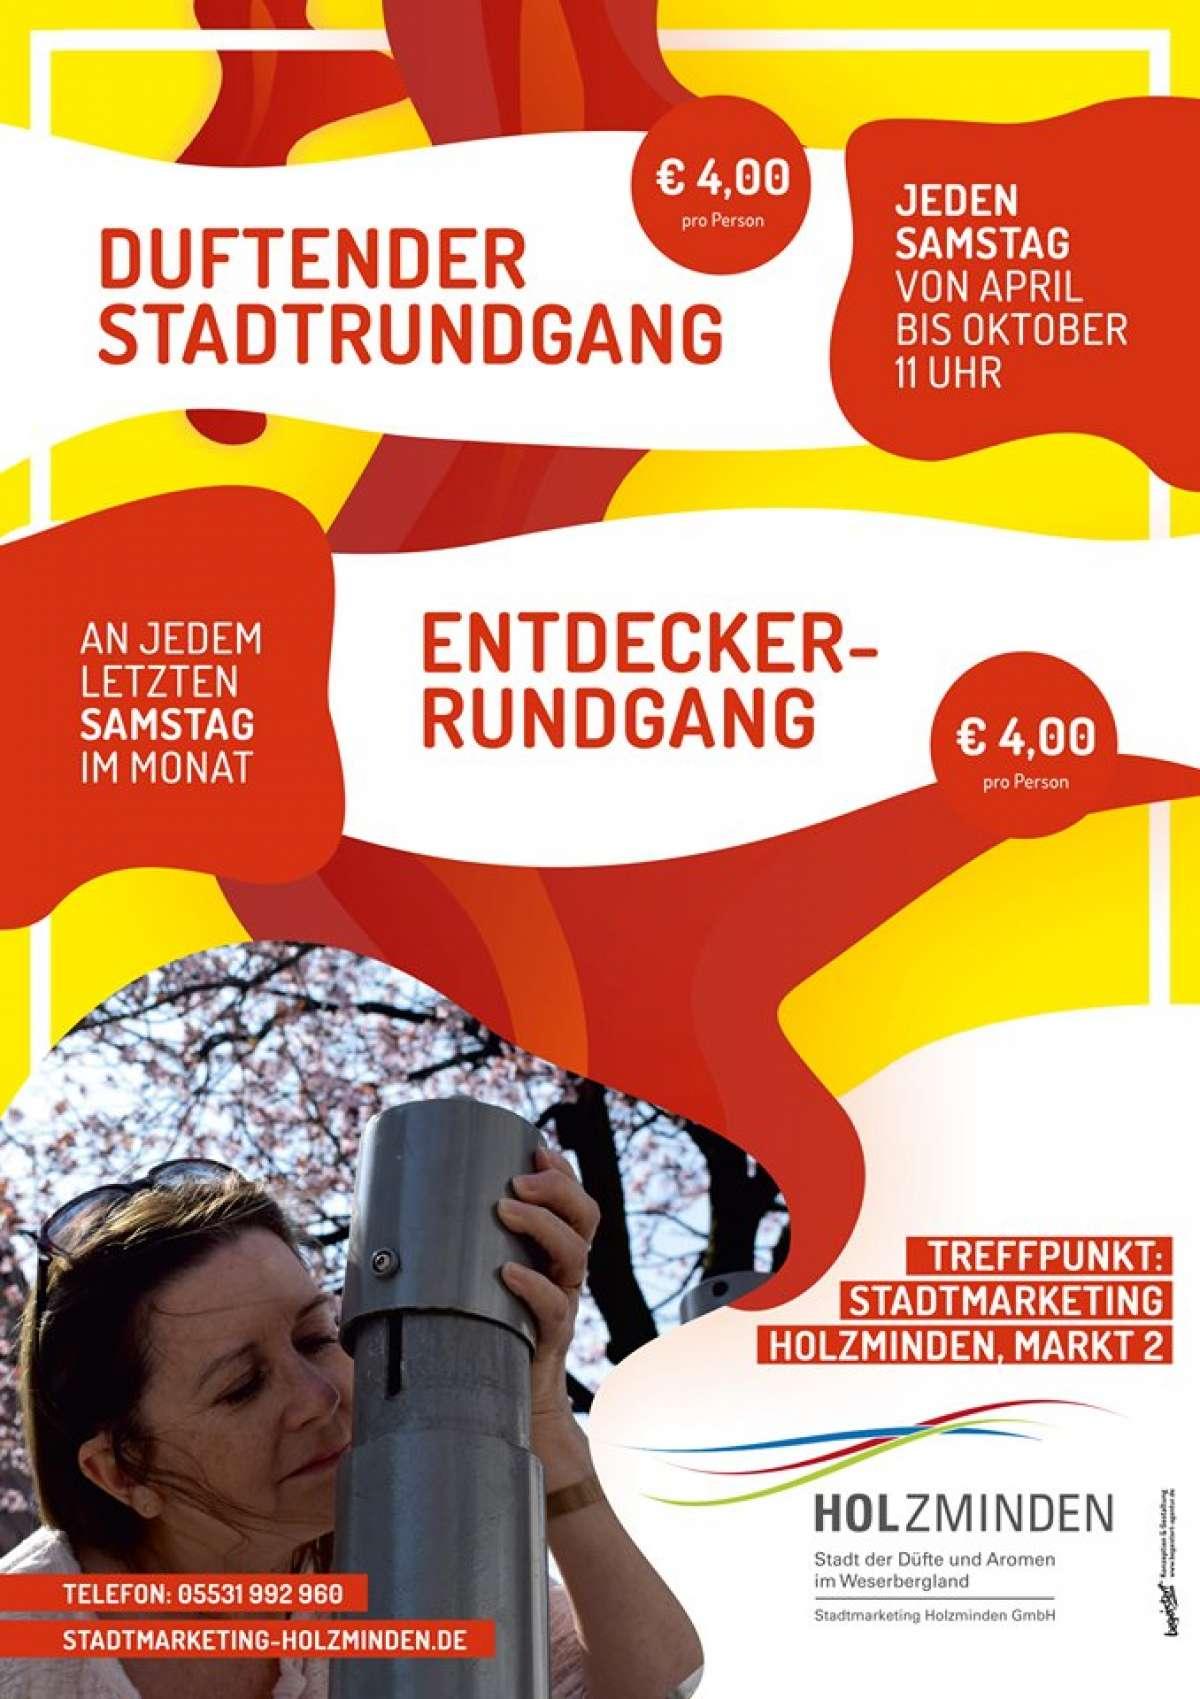 Duftender Stadtrundgang - Innenstadt  - Holzminden